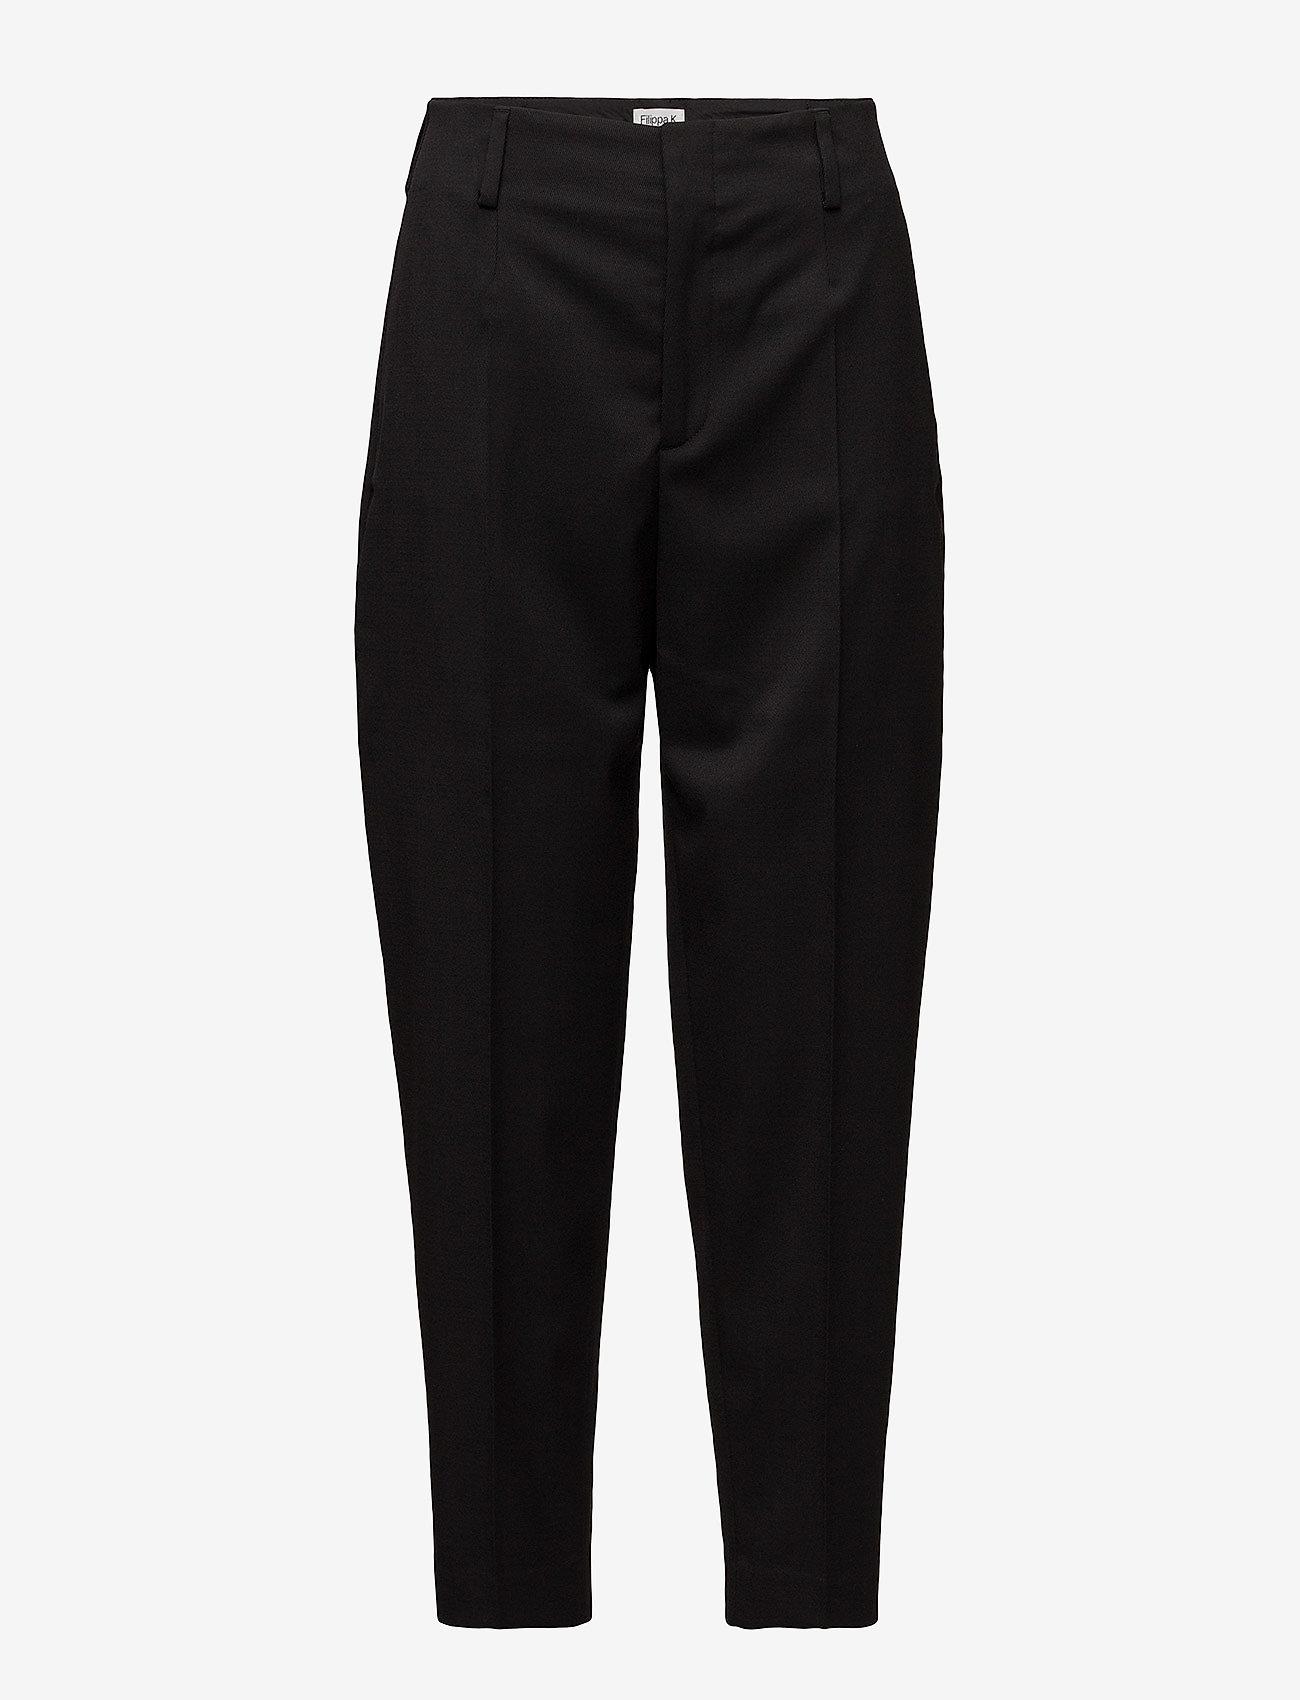 Filippa K - Karlie Trousers - straight leg trousers - black - 0